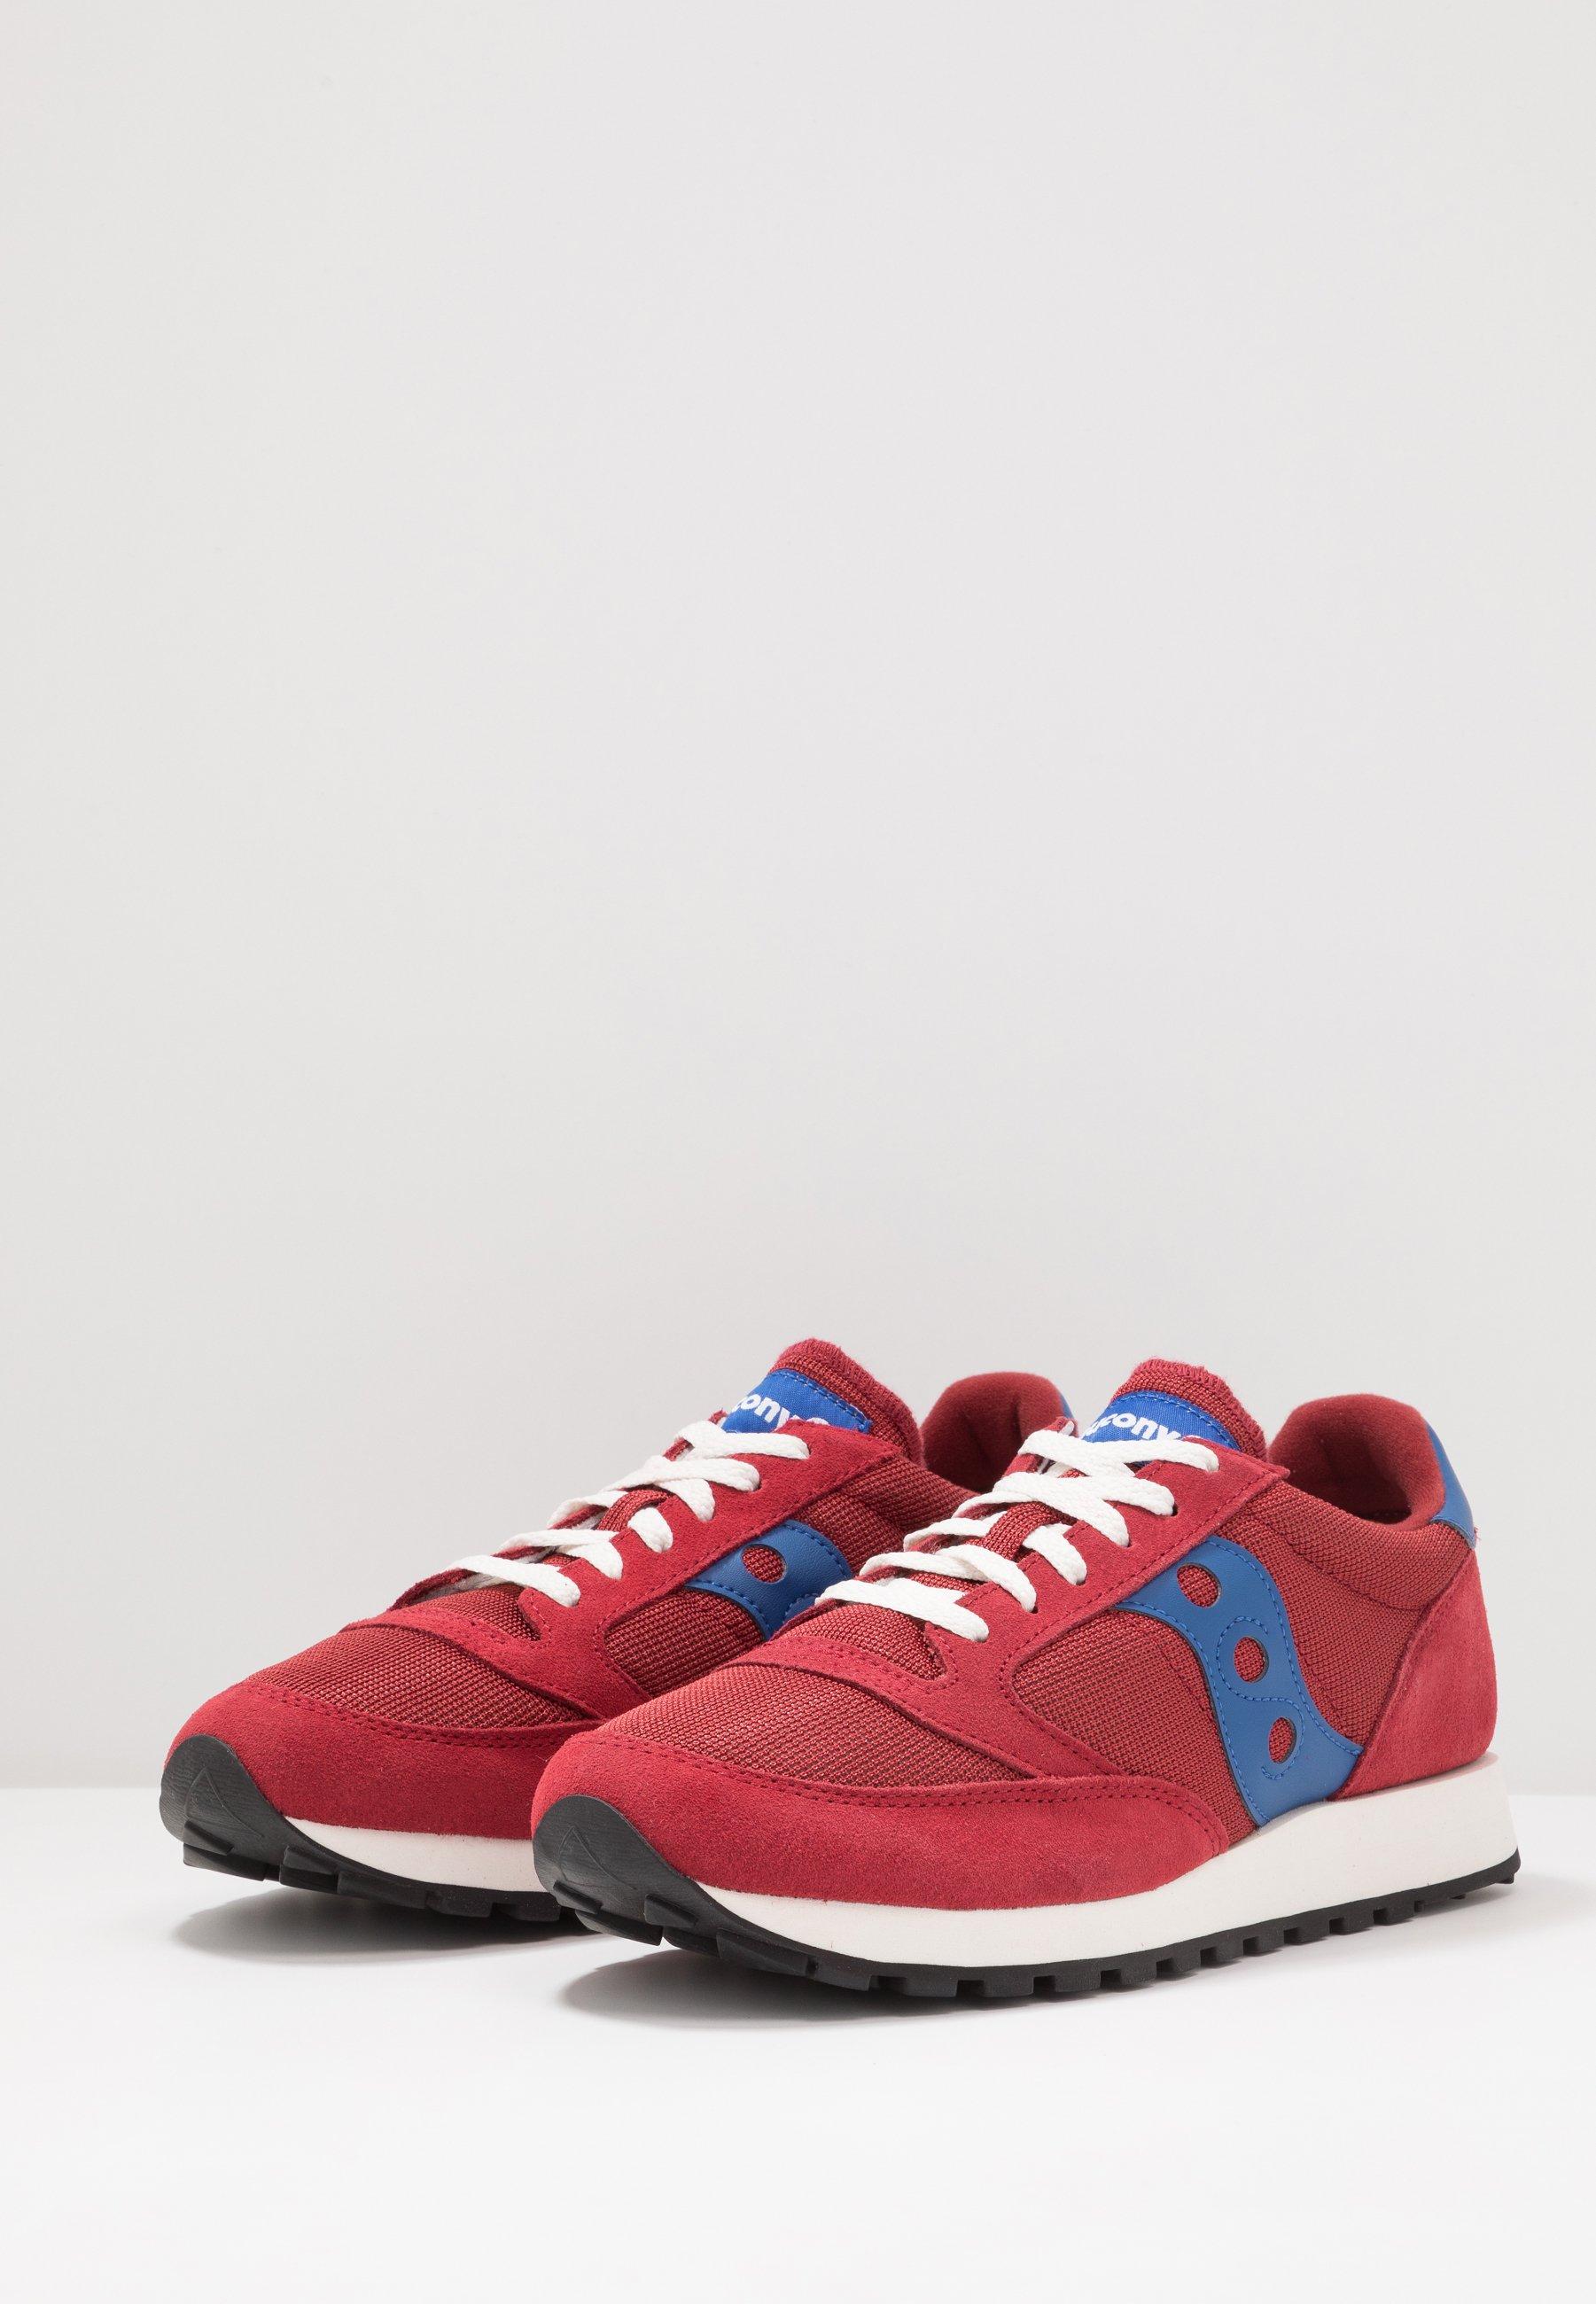 Saucony Jazz Vintage - Sneakers Red/blue